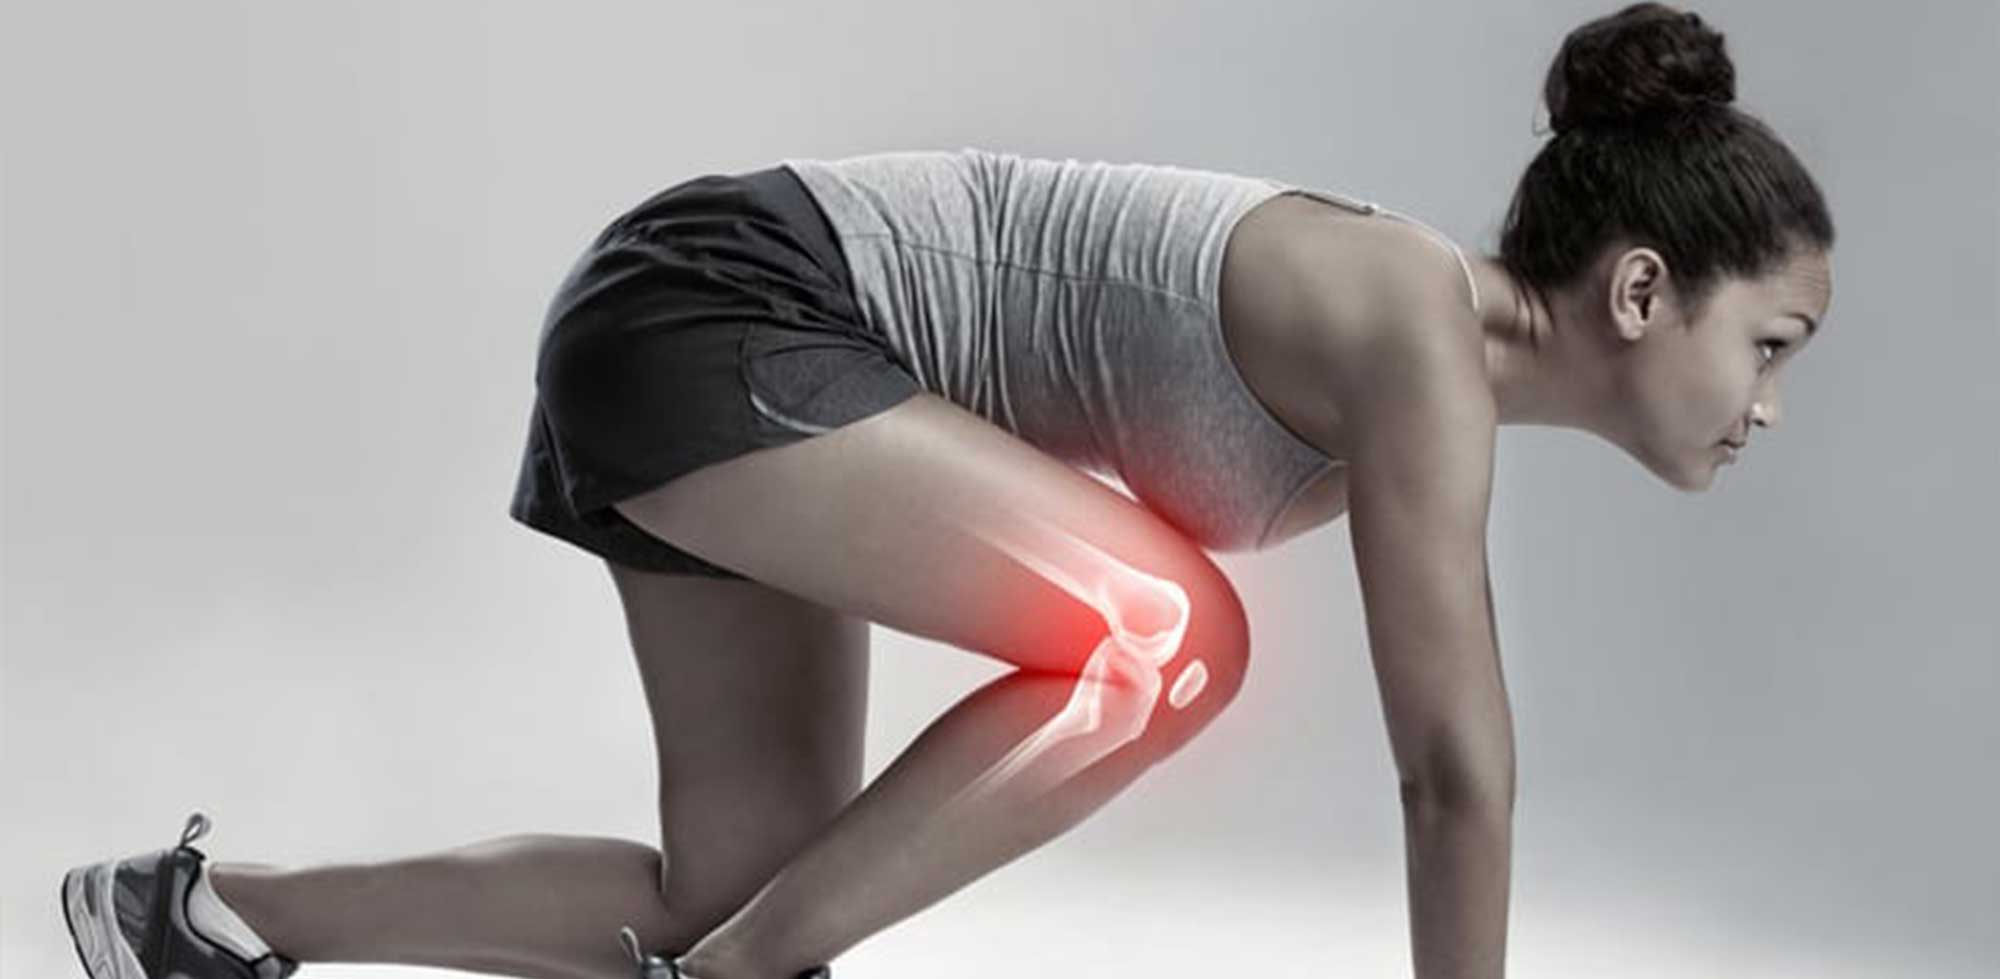 Daniel Sunwoo, MD - Tarpon Orthopedics - Pain Management - Plano, TX